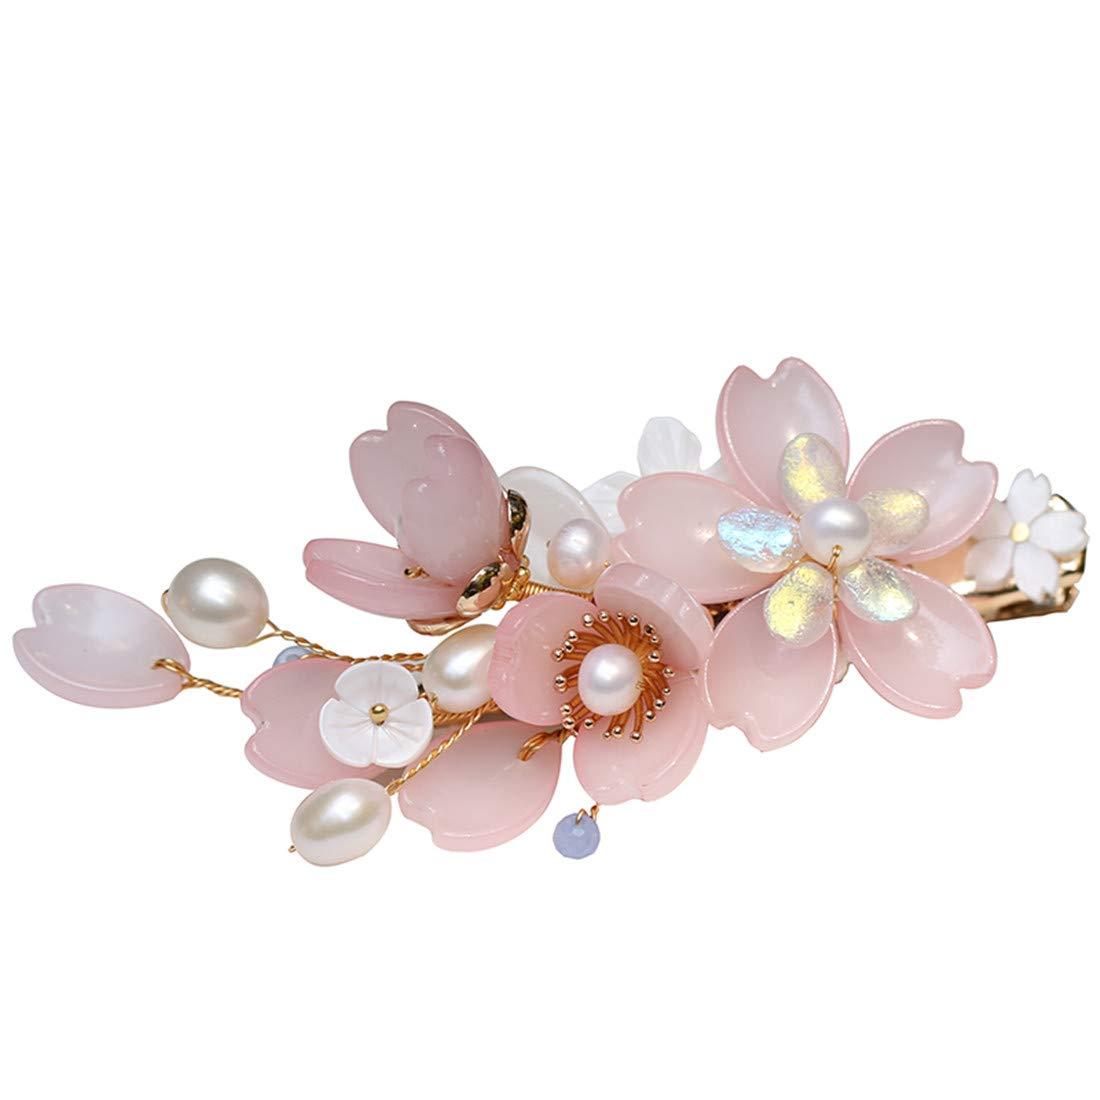 Retro Flower Hair Pin Comb Accessory for Kimono Hanfu Party Cosplay